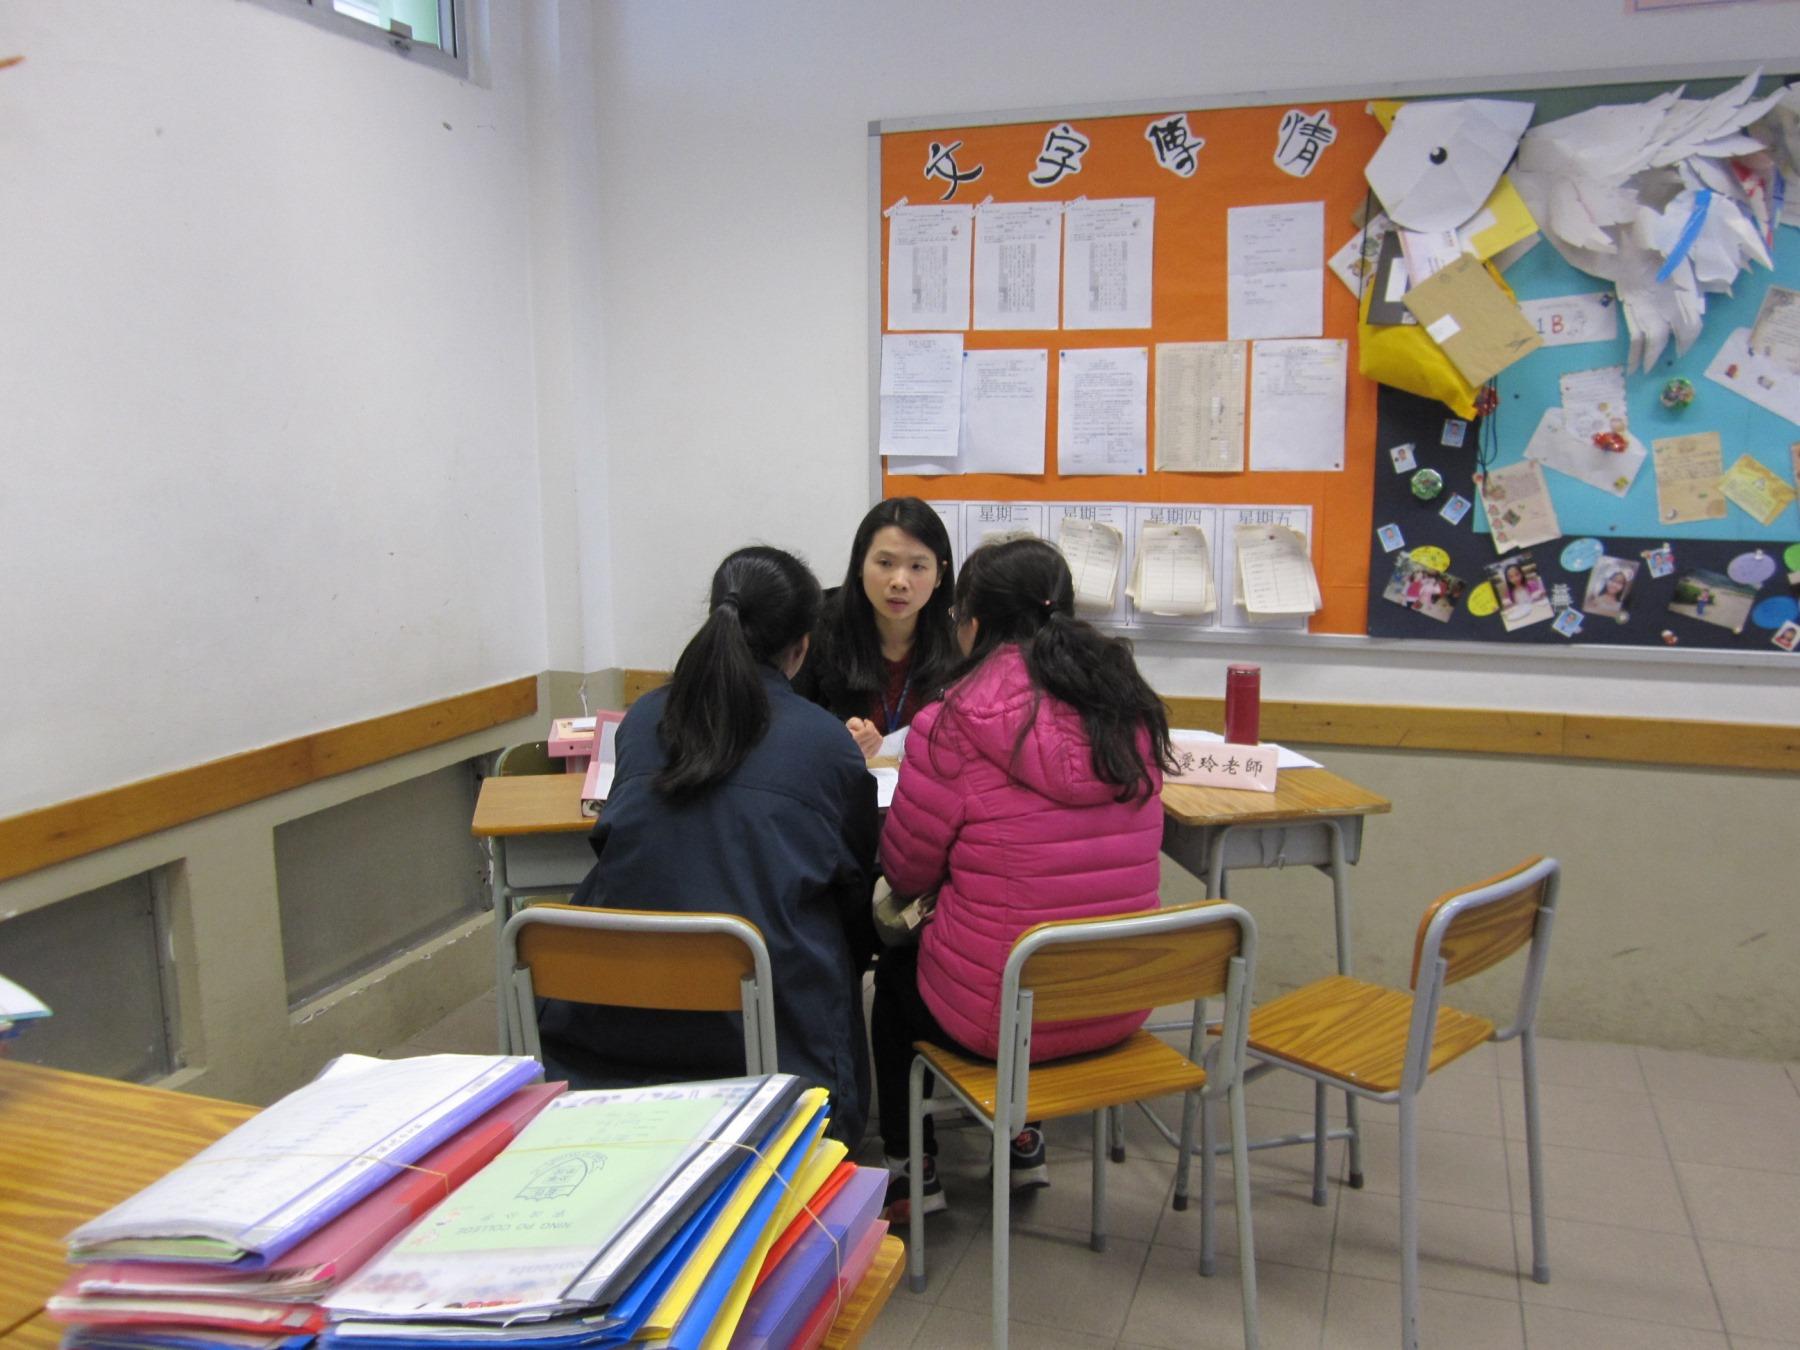 http://npc.edu.hk/sites/default/files/img_0503.jpg